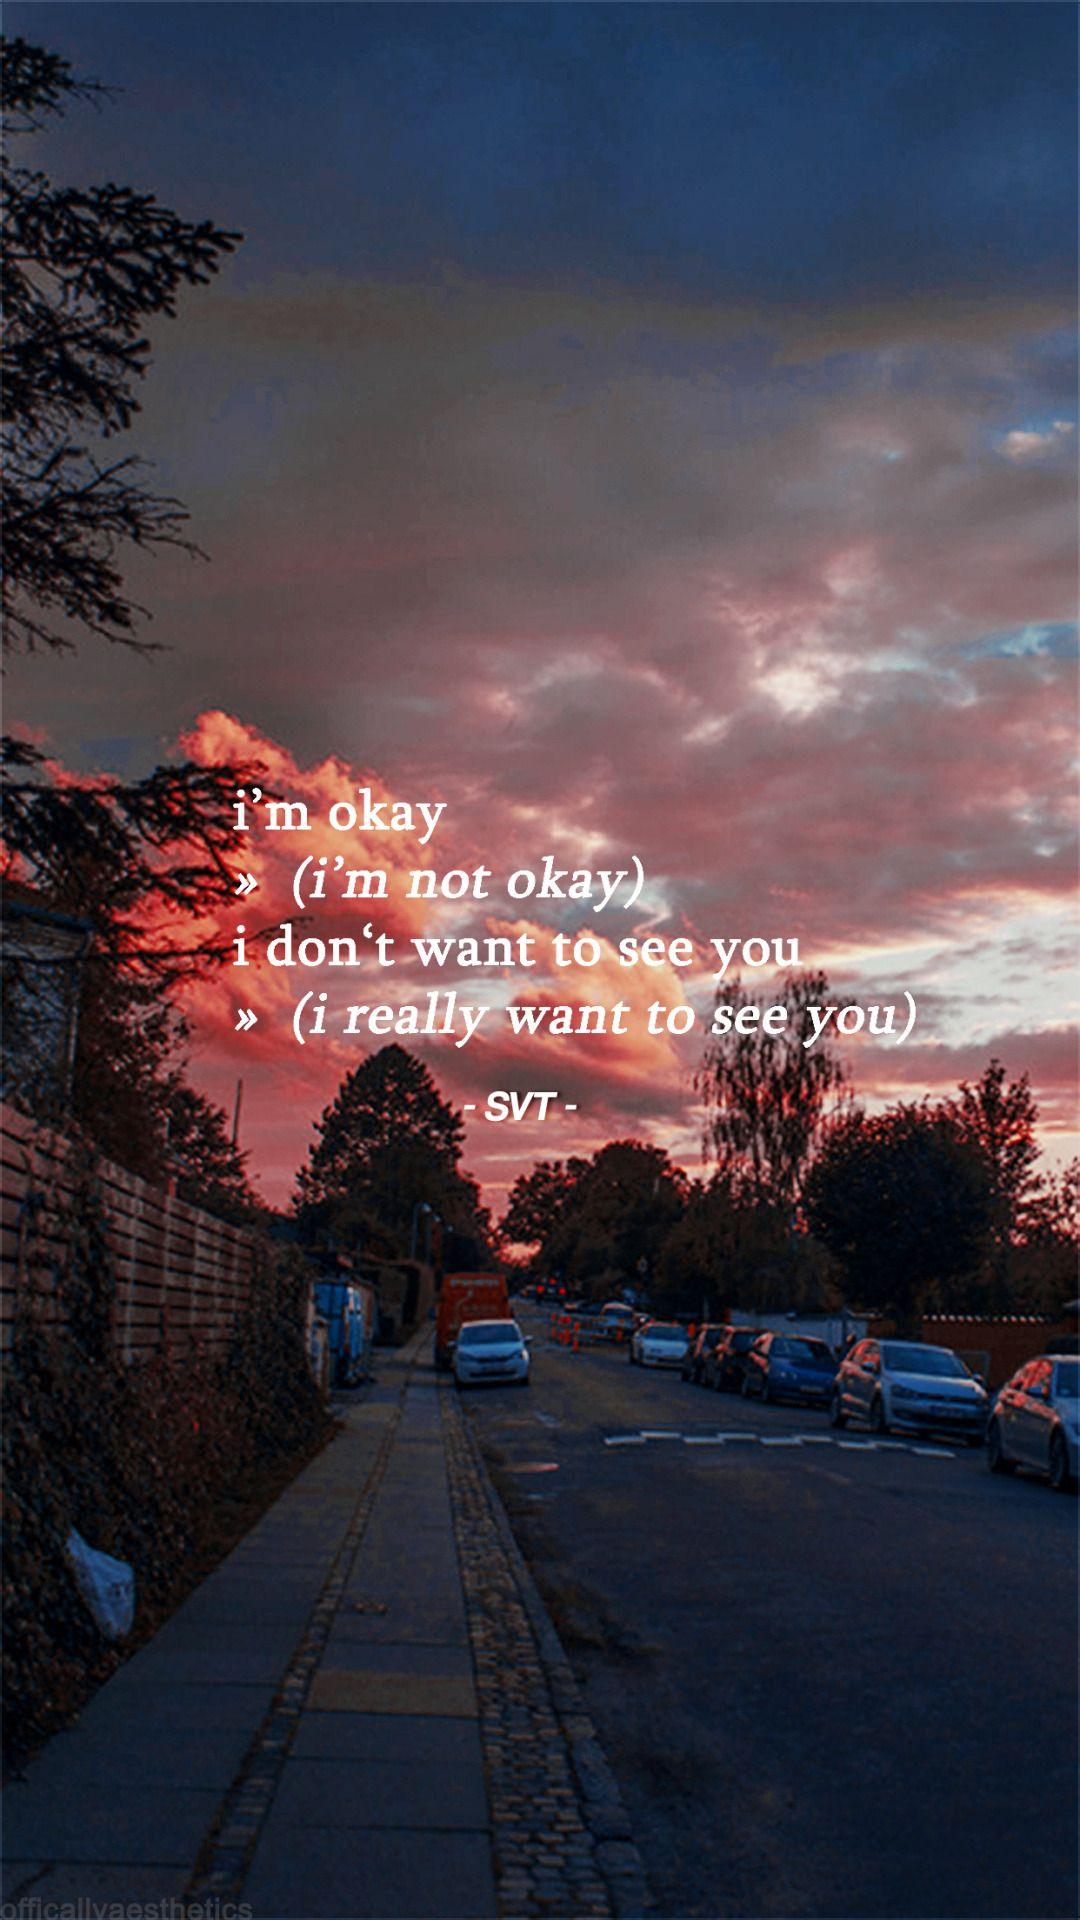 Kpop Quotes Wallpaper 187 Seventeen Aesthetic Lyrics Lockscreens Left Highlight